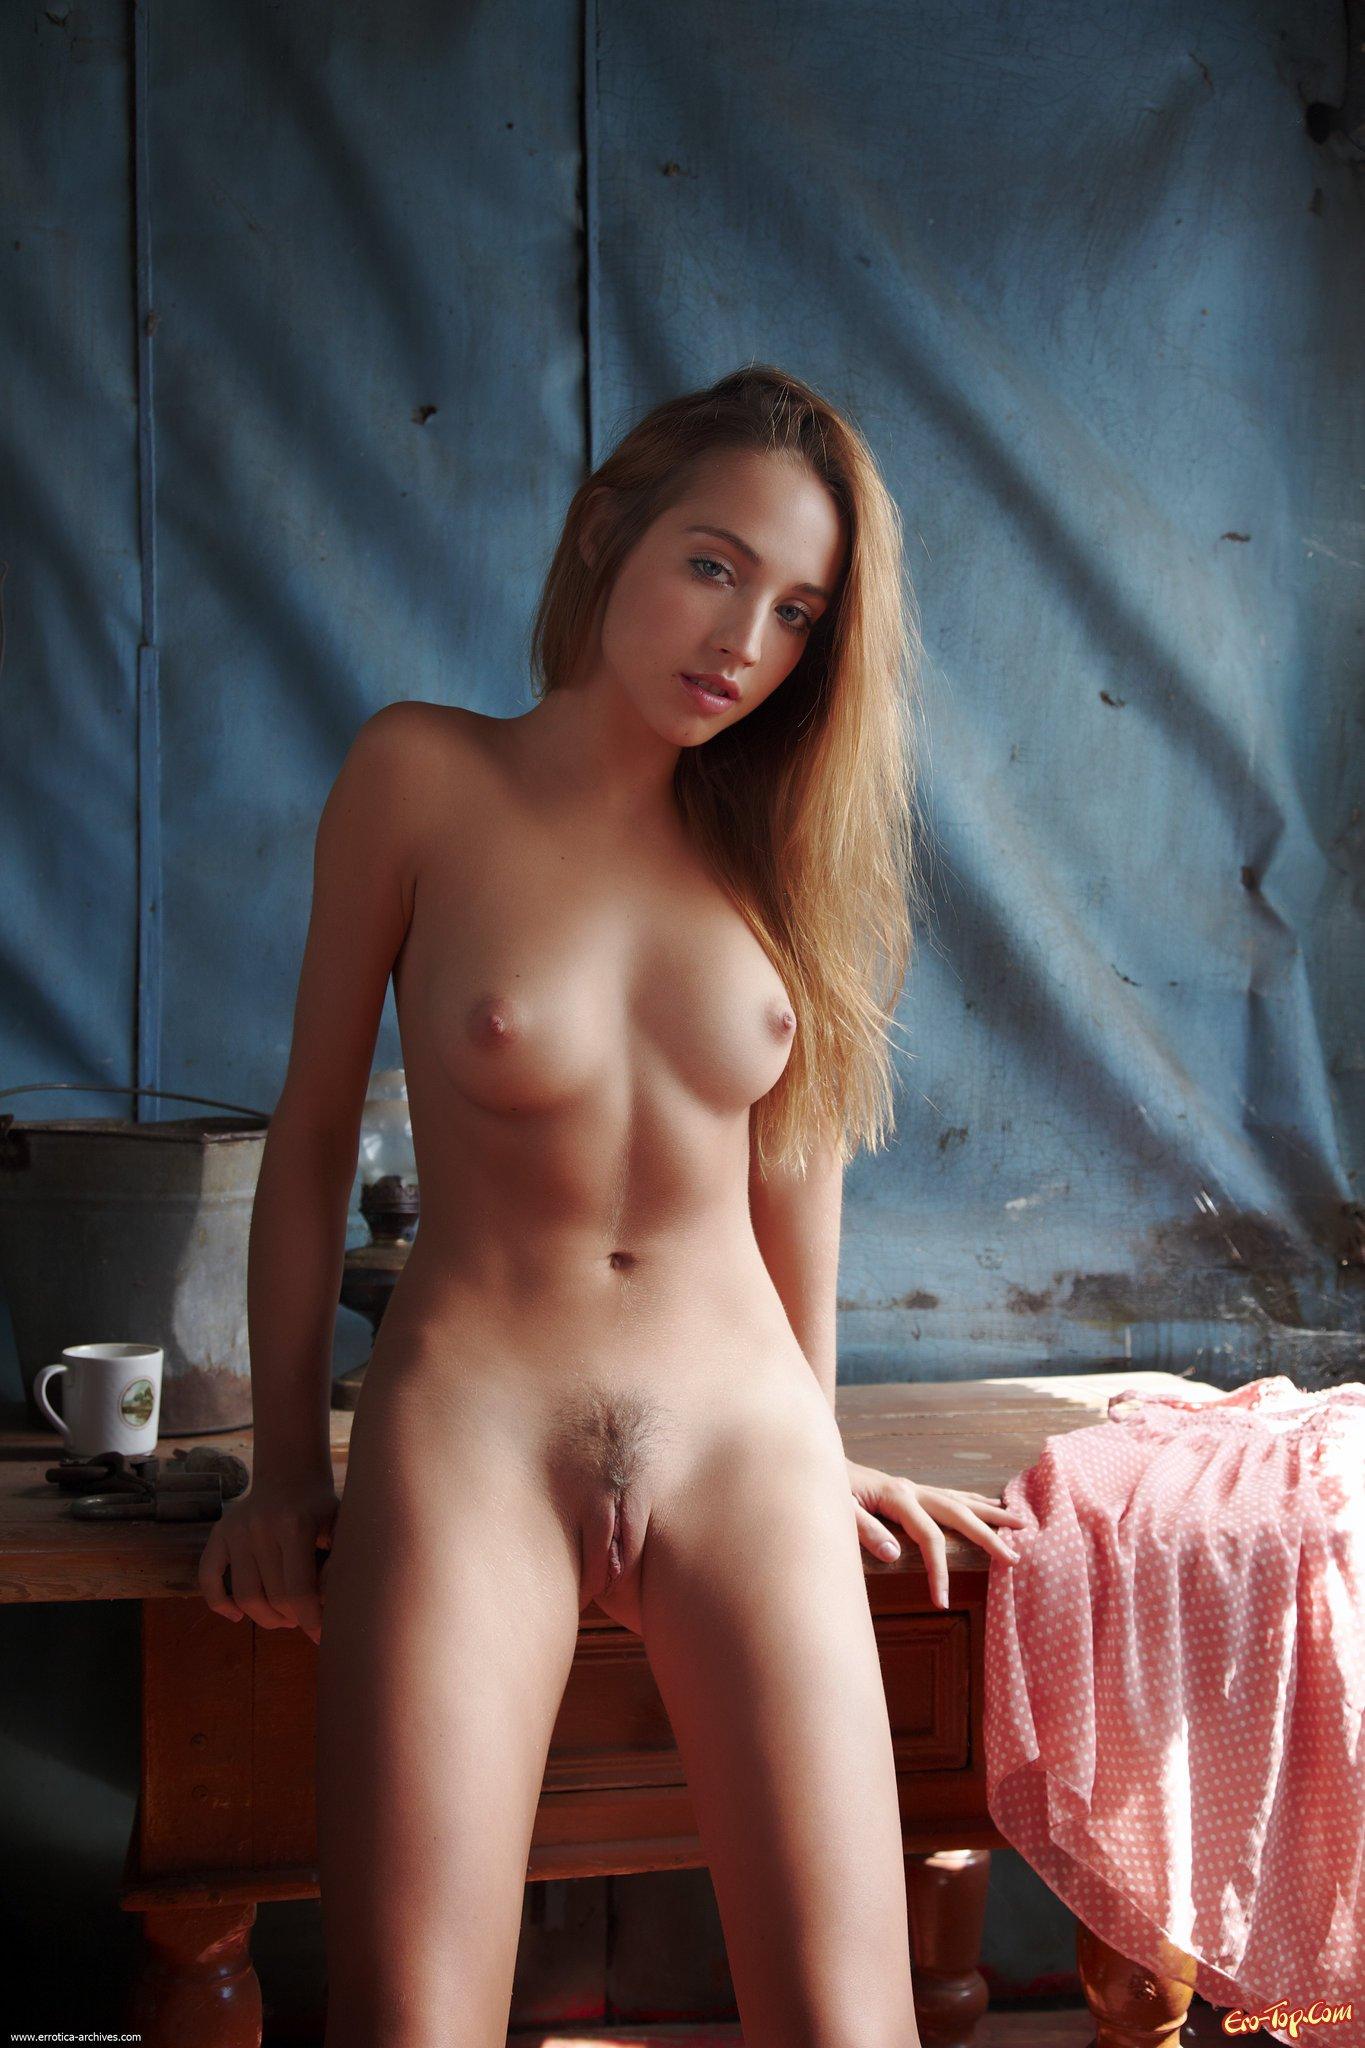 Девушка разделась до гола